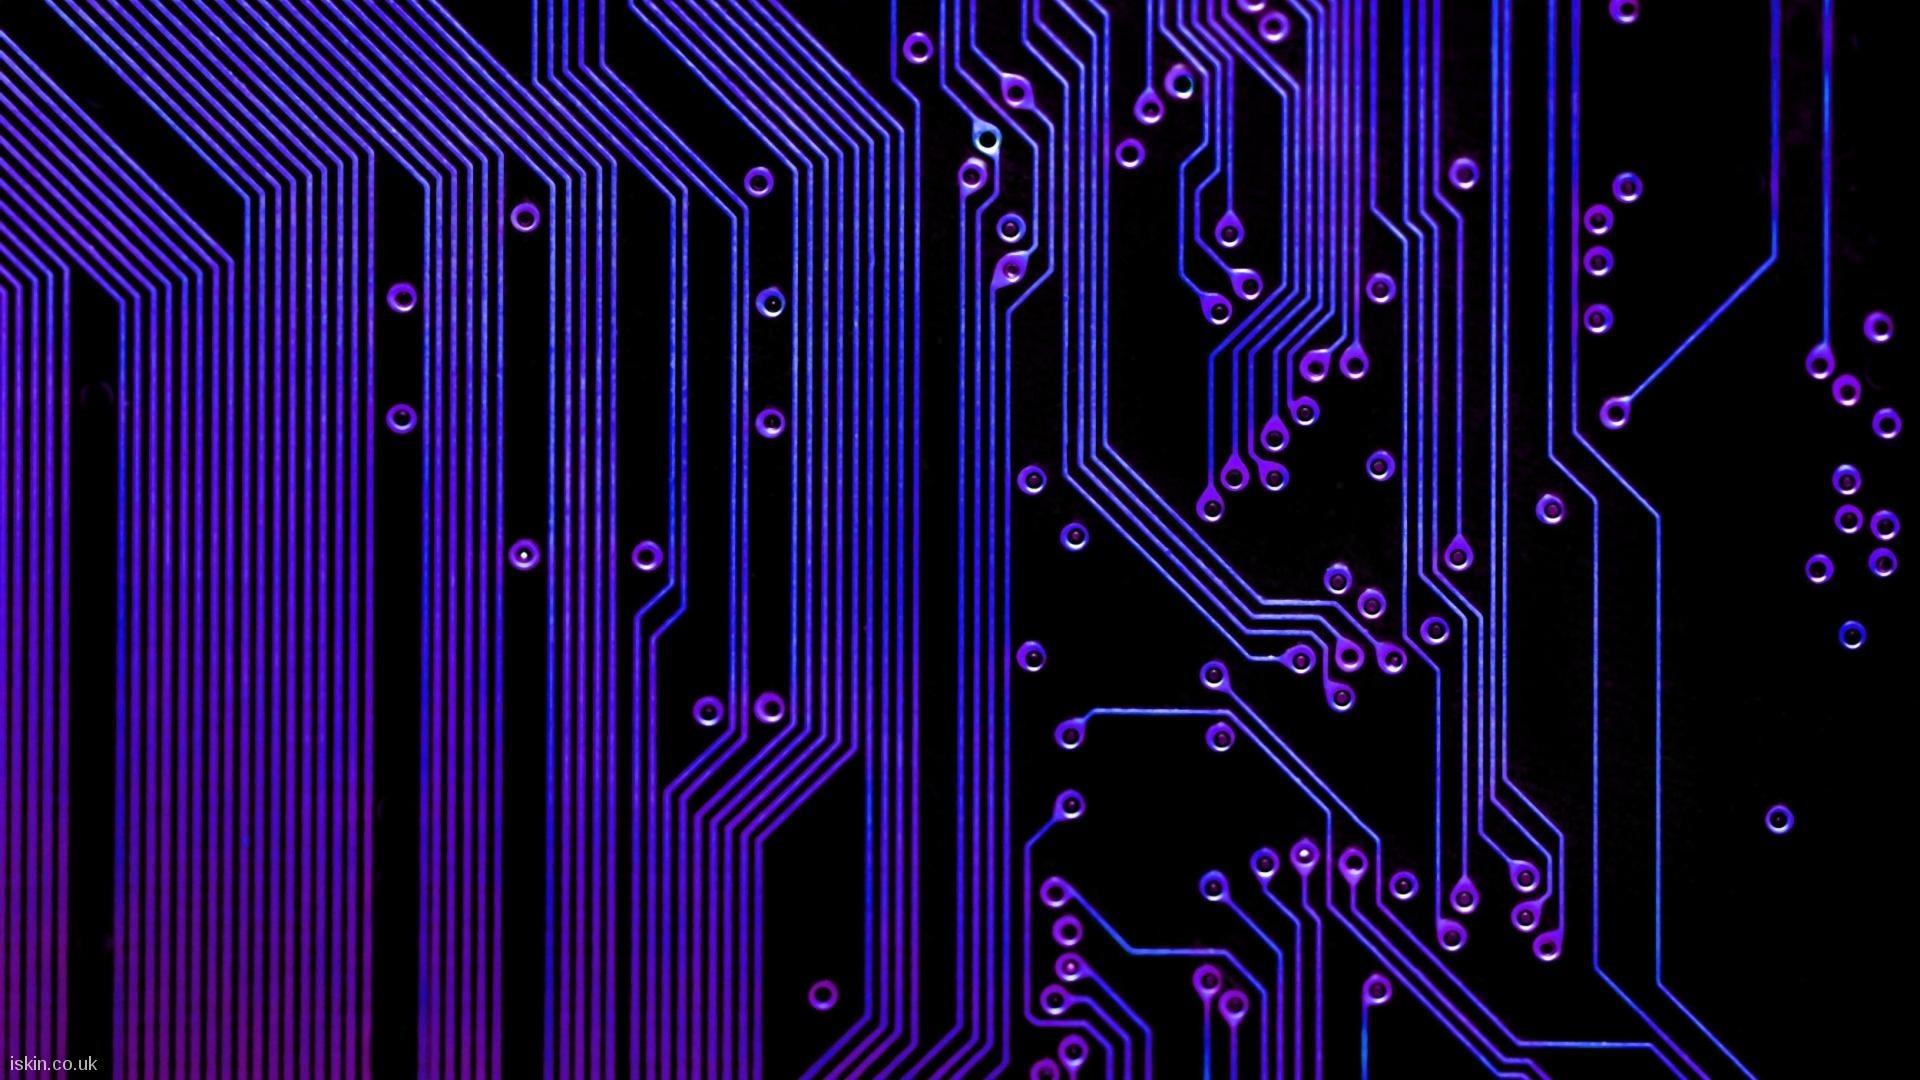 Circuit Board wallpaper photo hd